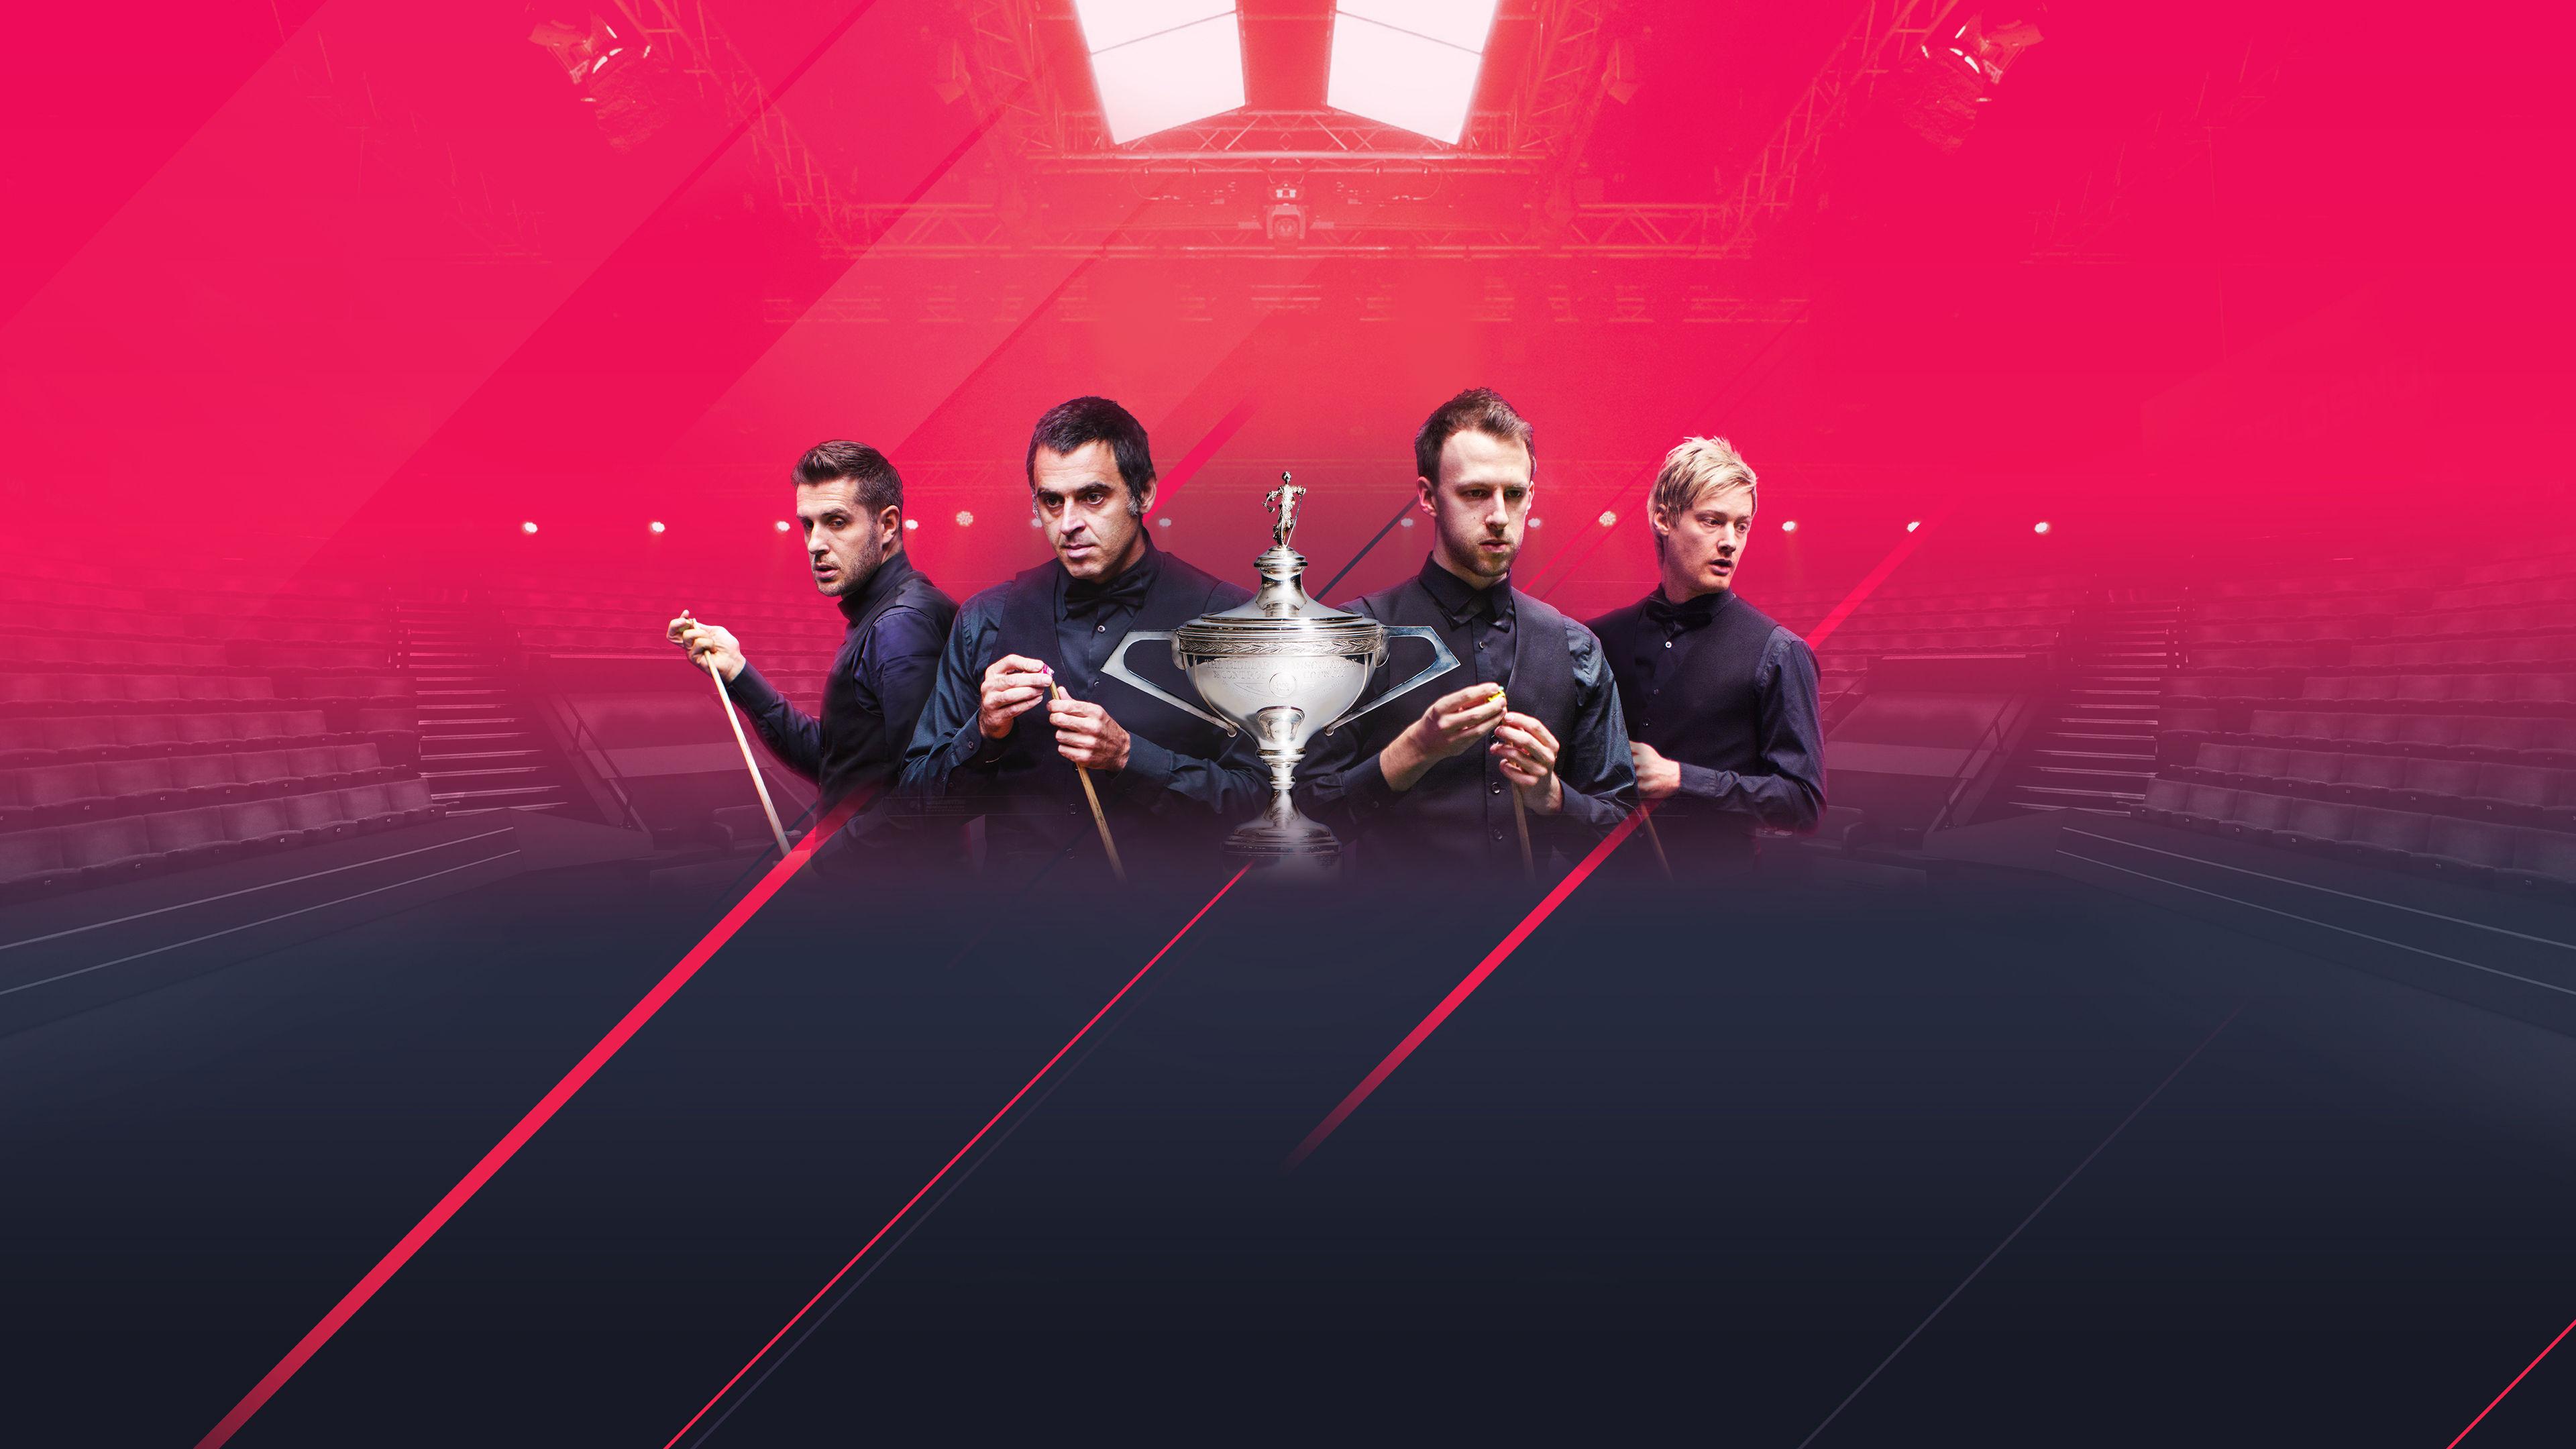 Snooker 19 выйдет на Switch 23 августа